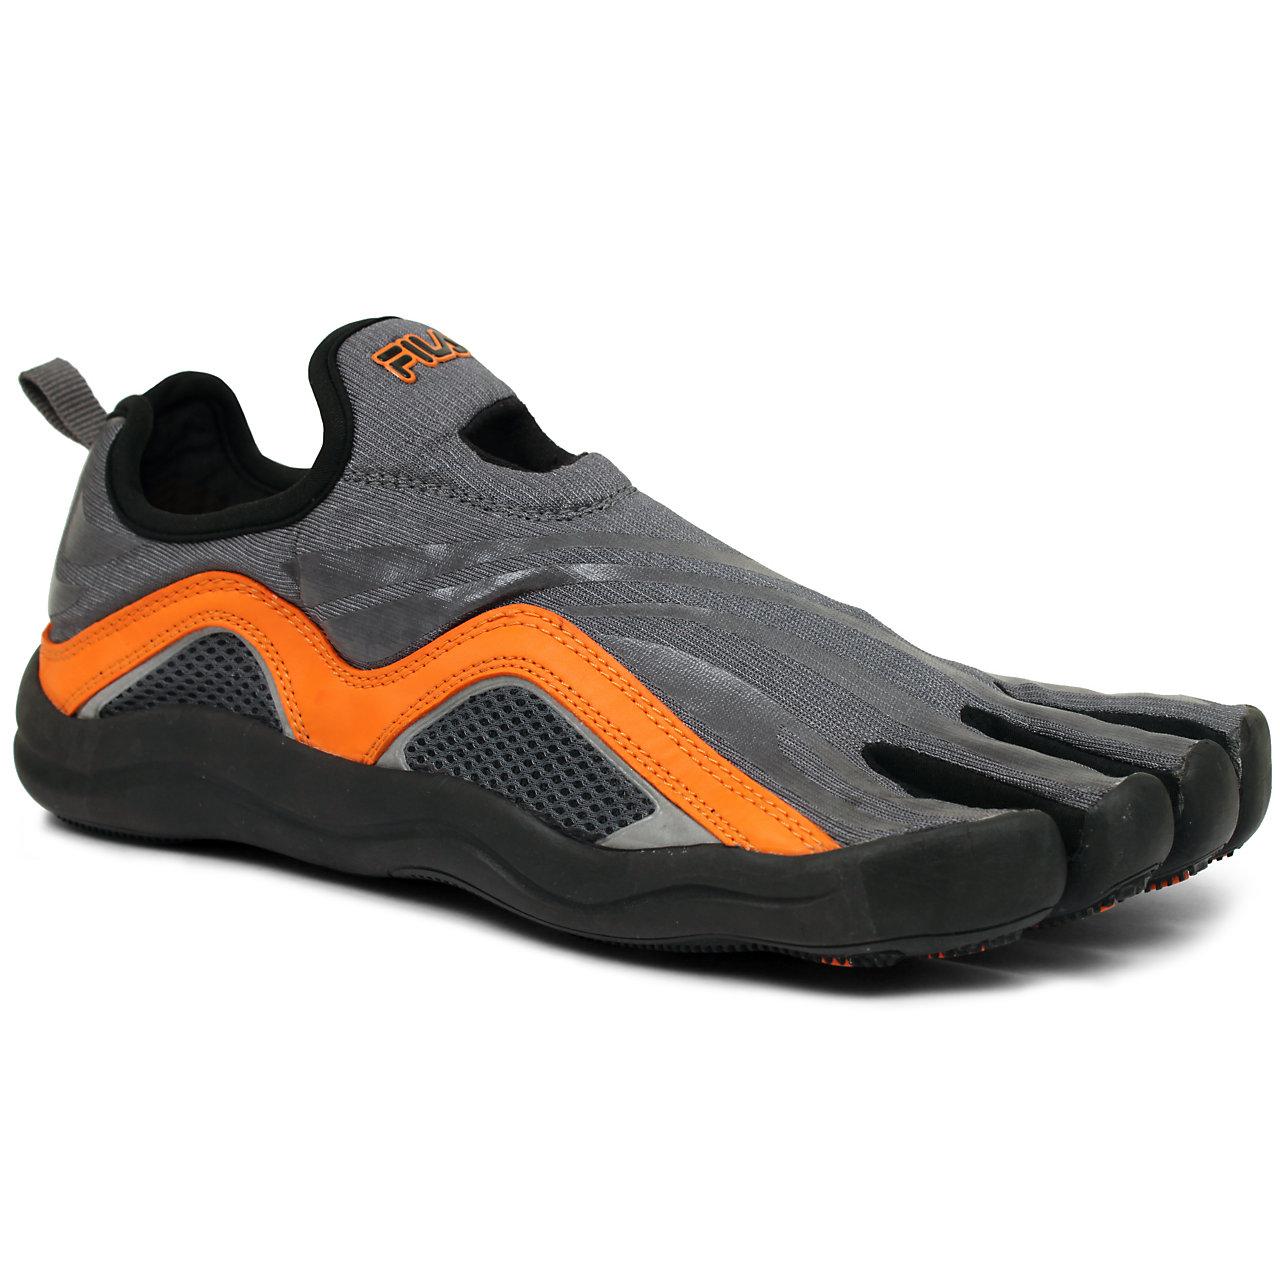 Men S Skele Toes Shoes